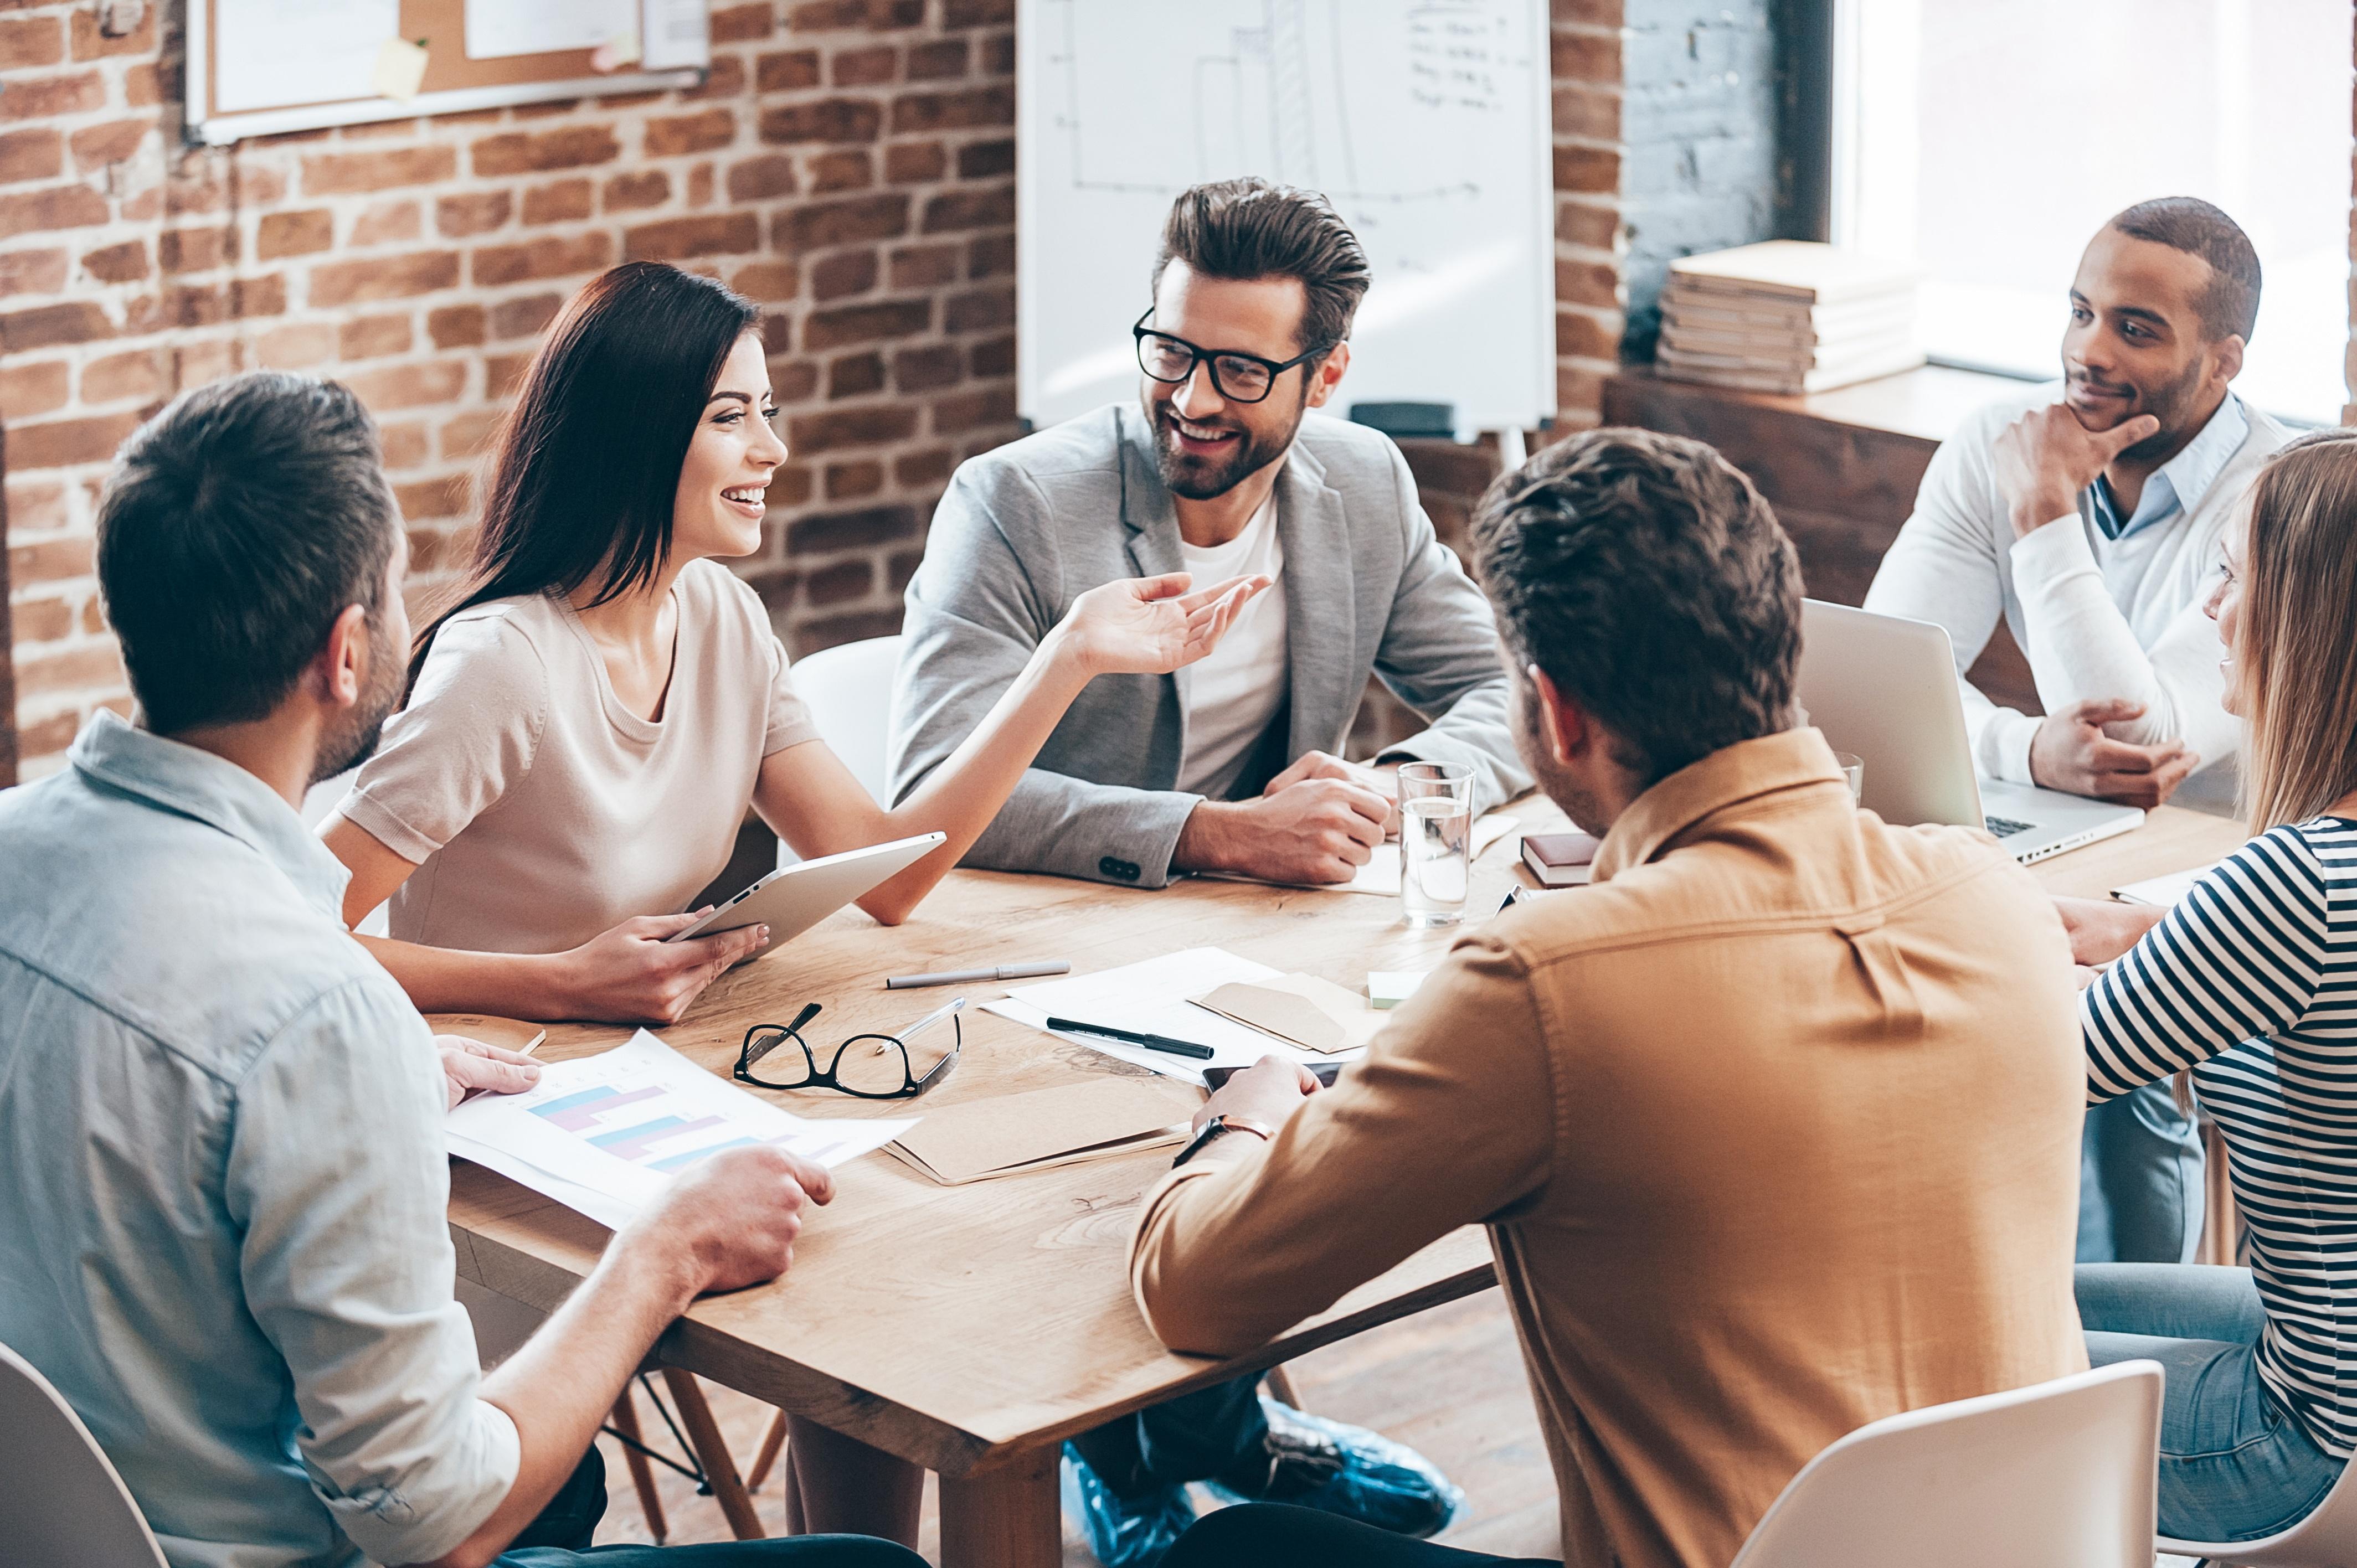 Planungslösungen sind oft Teamlösungen